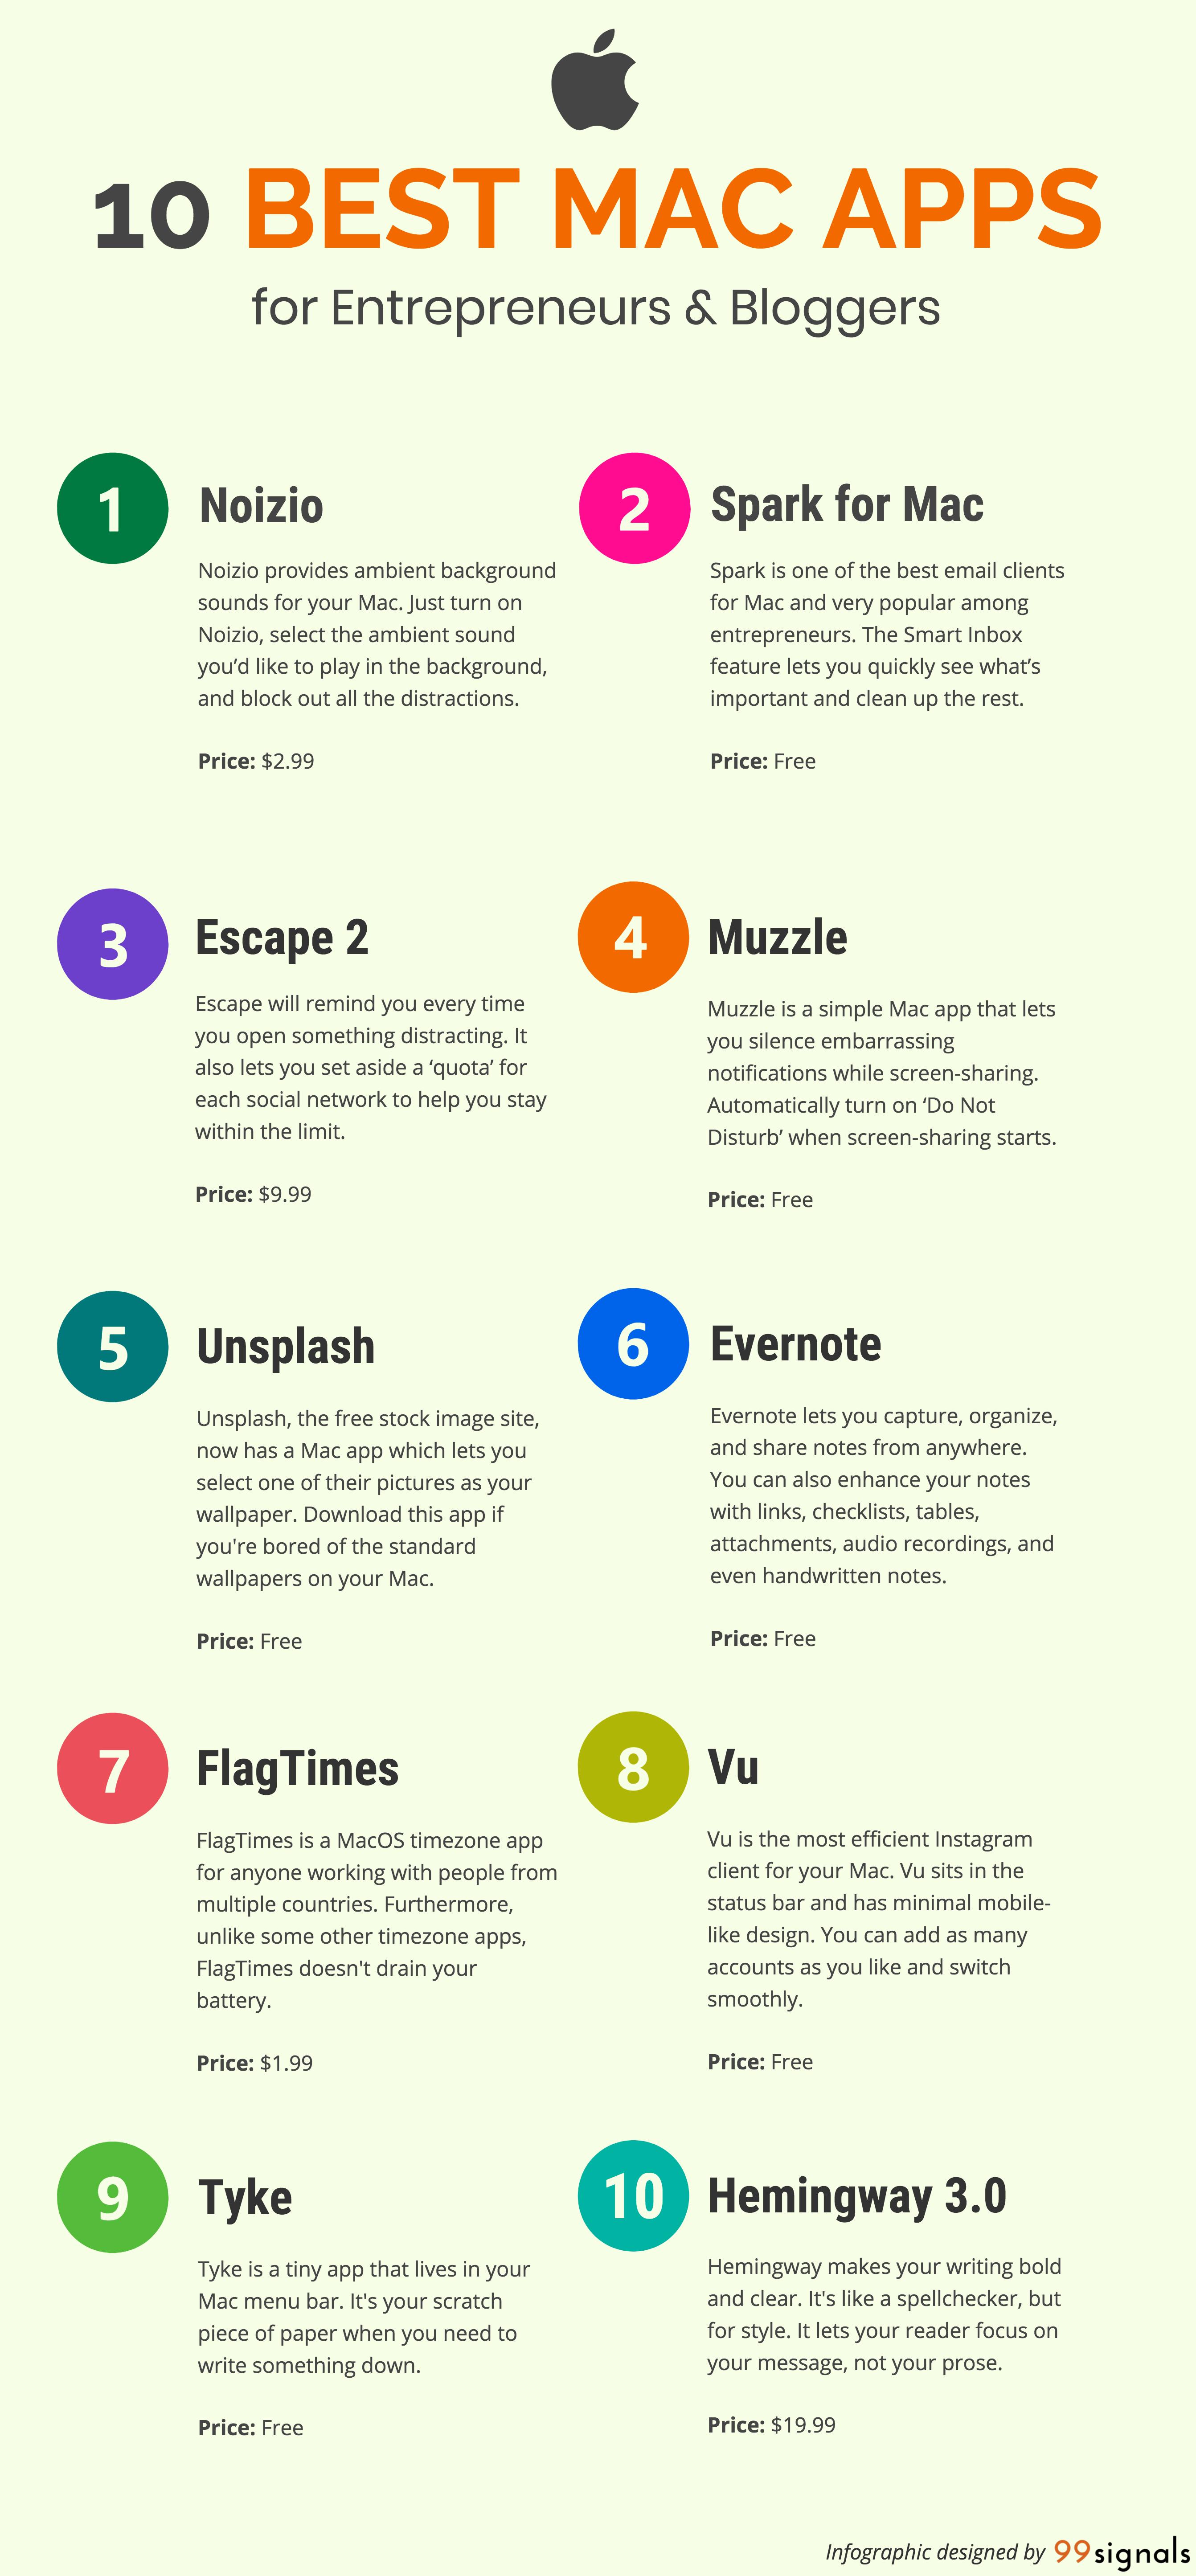 10 Best Mac Apps for Entrepreneurs & Bloggers (Infographic)